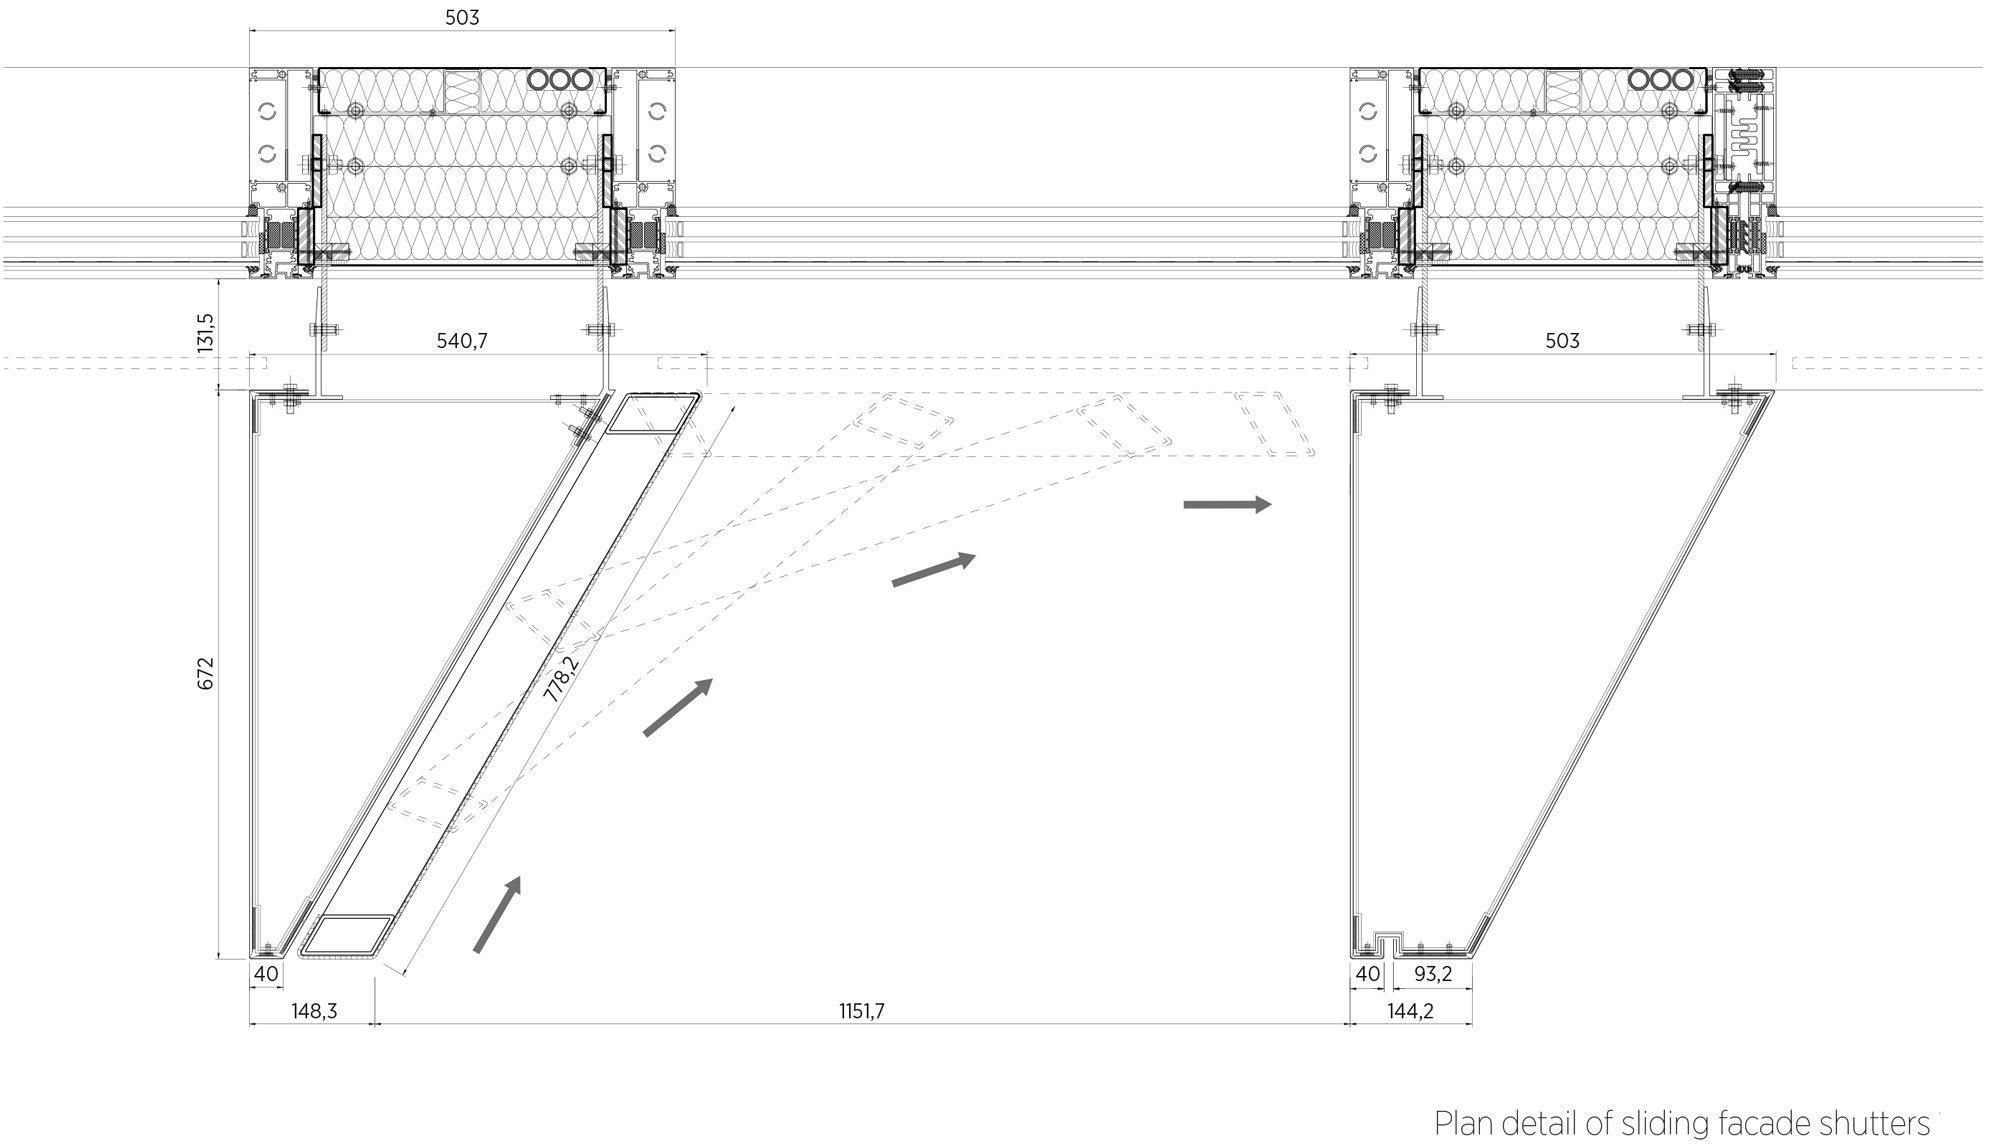 Dettaglio B © C.F. Møller Architects